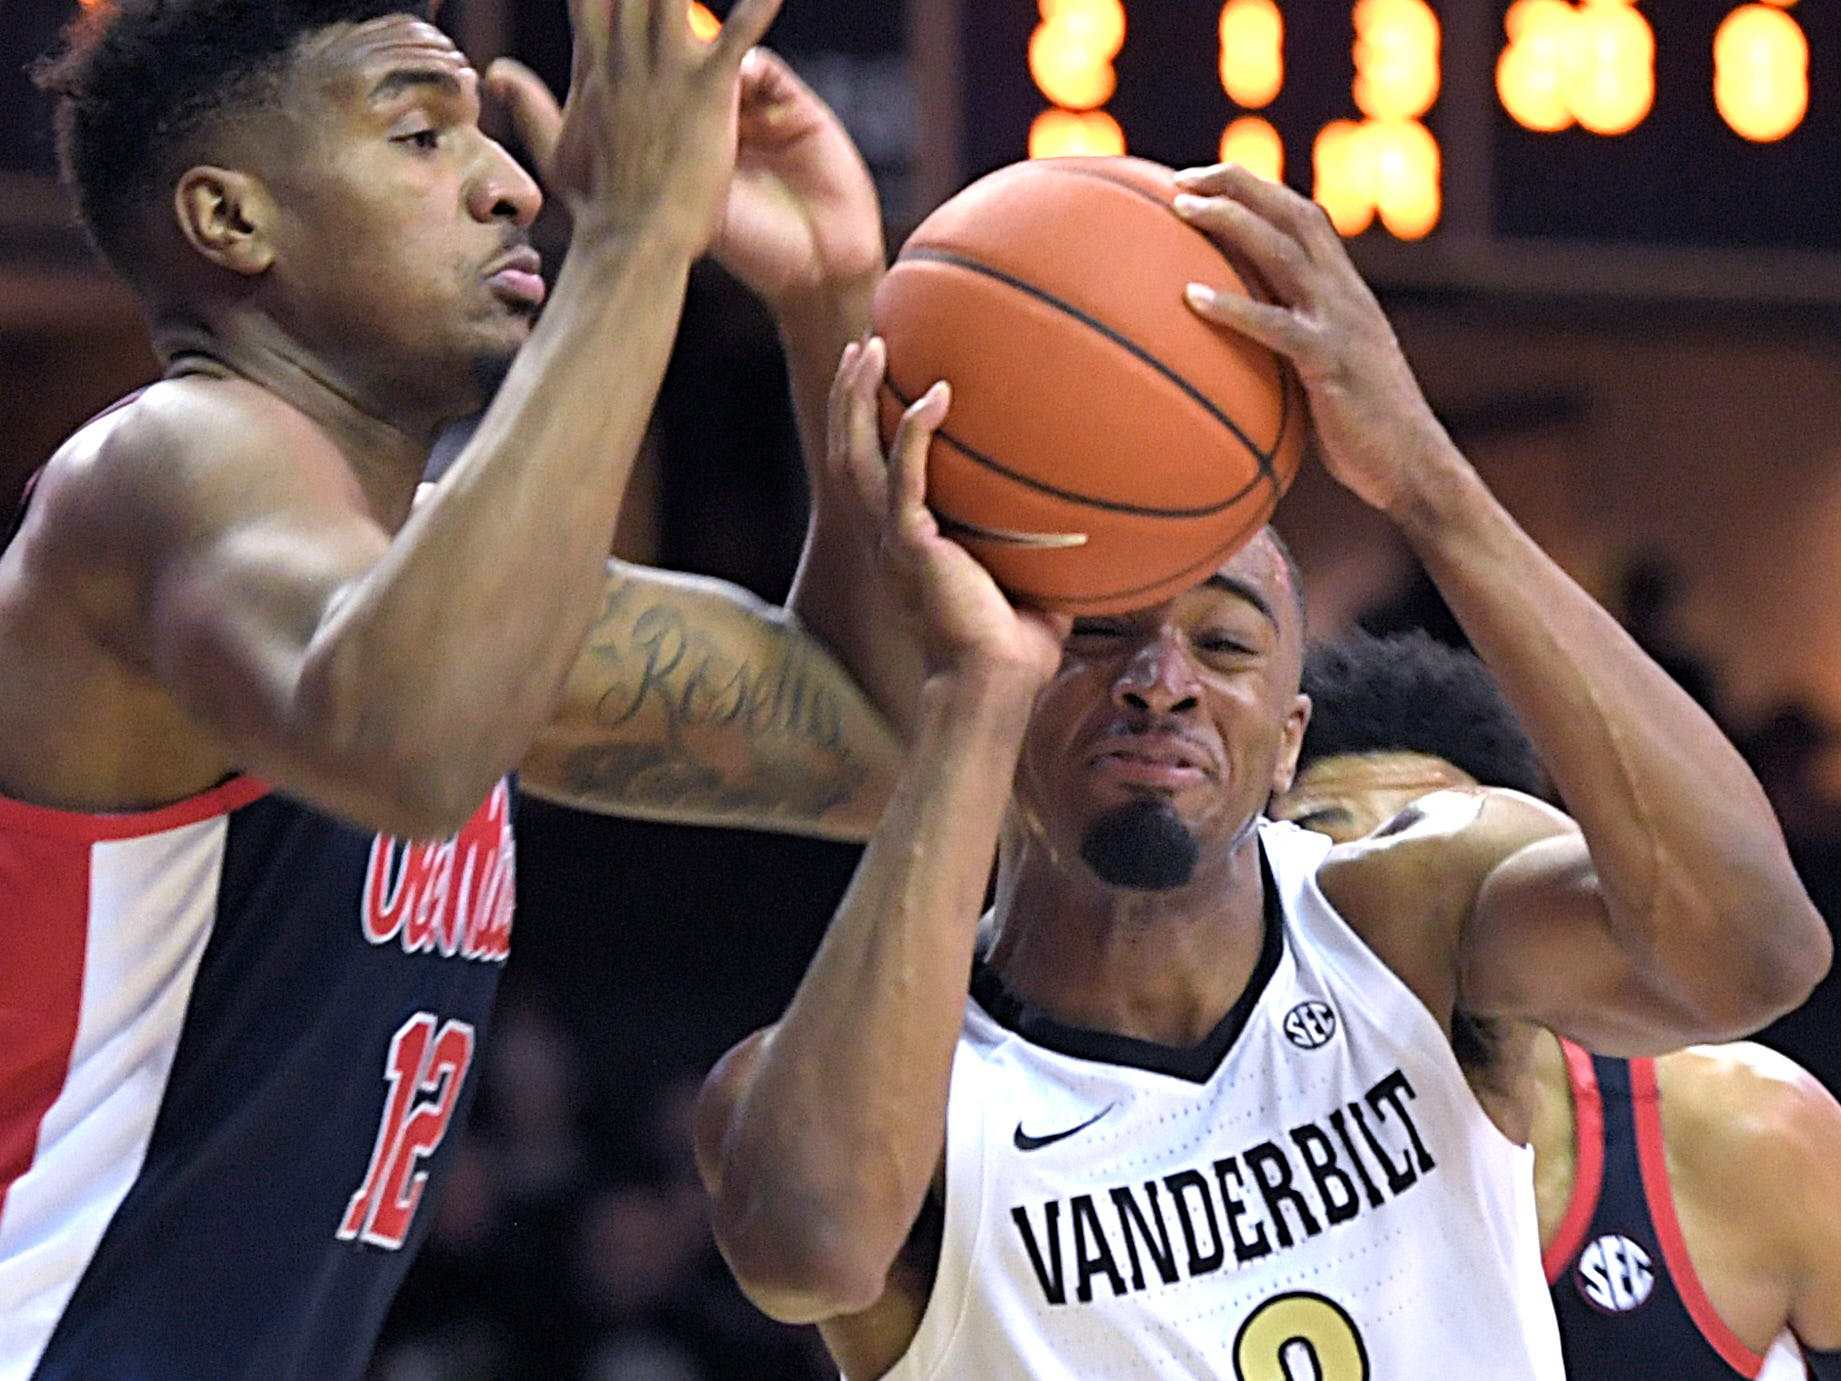 Vanderbilt guard Joe Toye (2) drives to the basket against Mississippi forward Bruce Stevens (12) during the second half at Memorial Gym in Nashville on Saturday, Jan. 5, 2019.